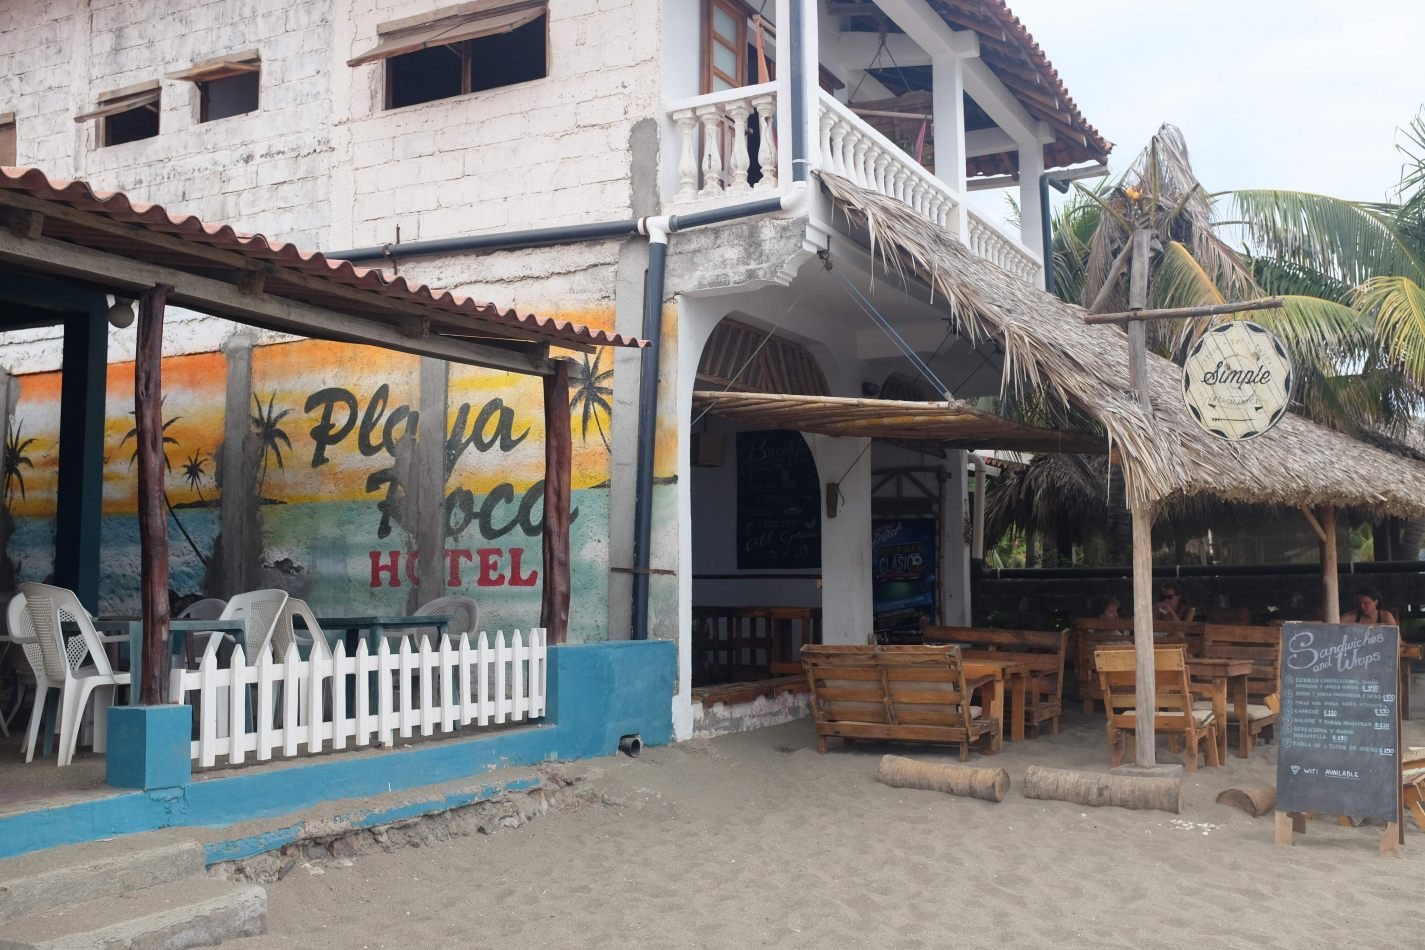 Hibiscus & Nomada : - - Playa Roca Hotel